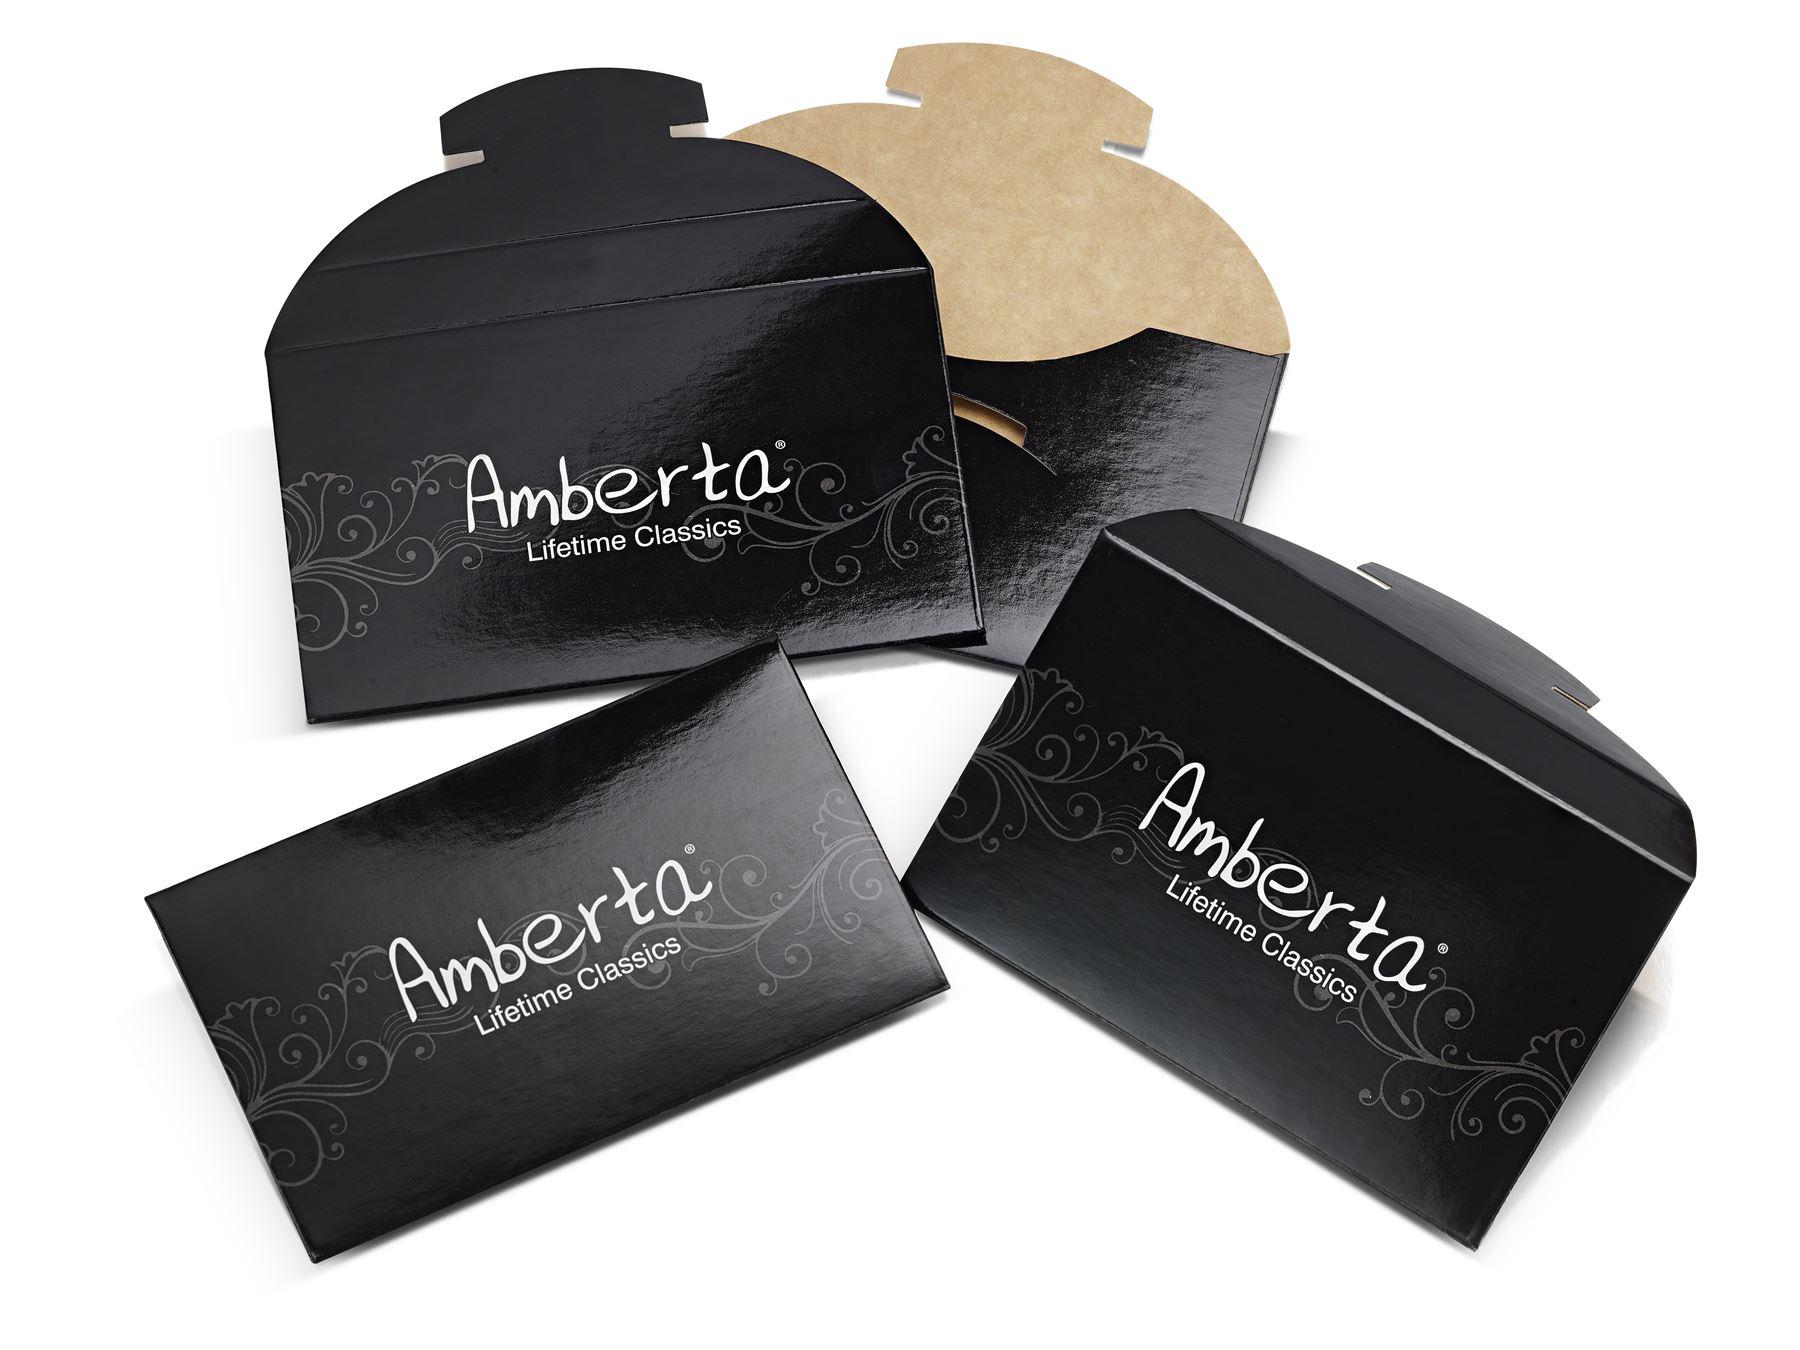 Amberta-Jewelry-925-Sterling-Silver-Adjustable-Bracelet-Italian-Bangle-for-Women miniature 49